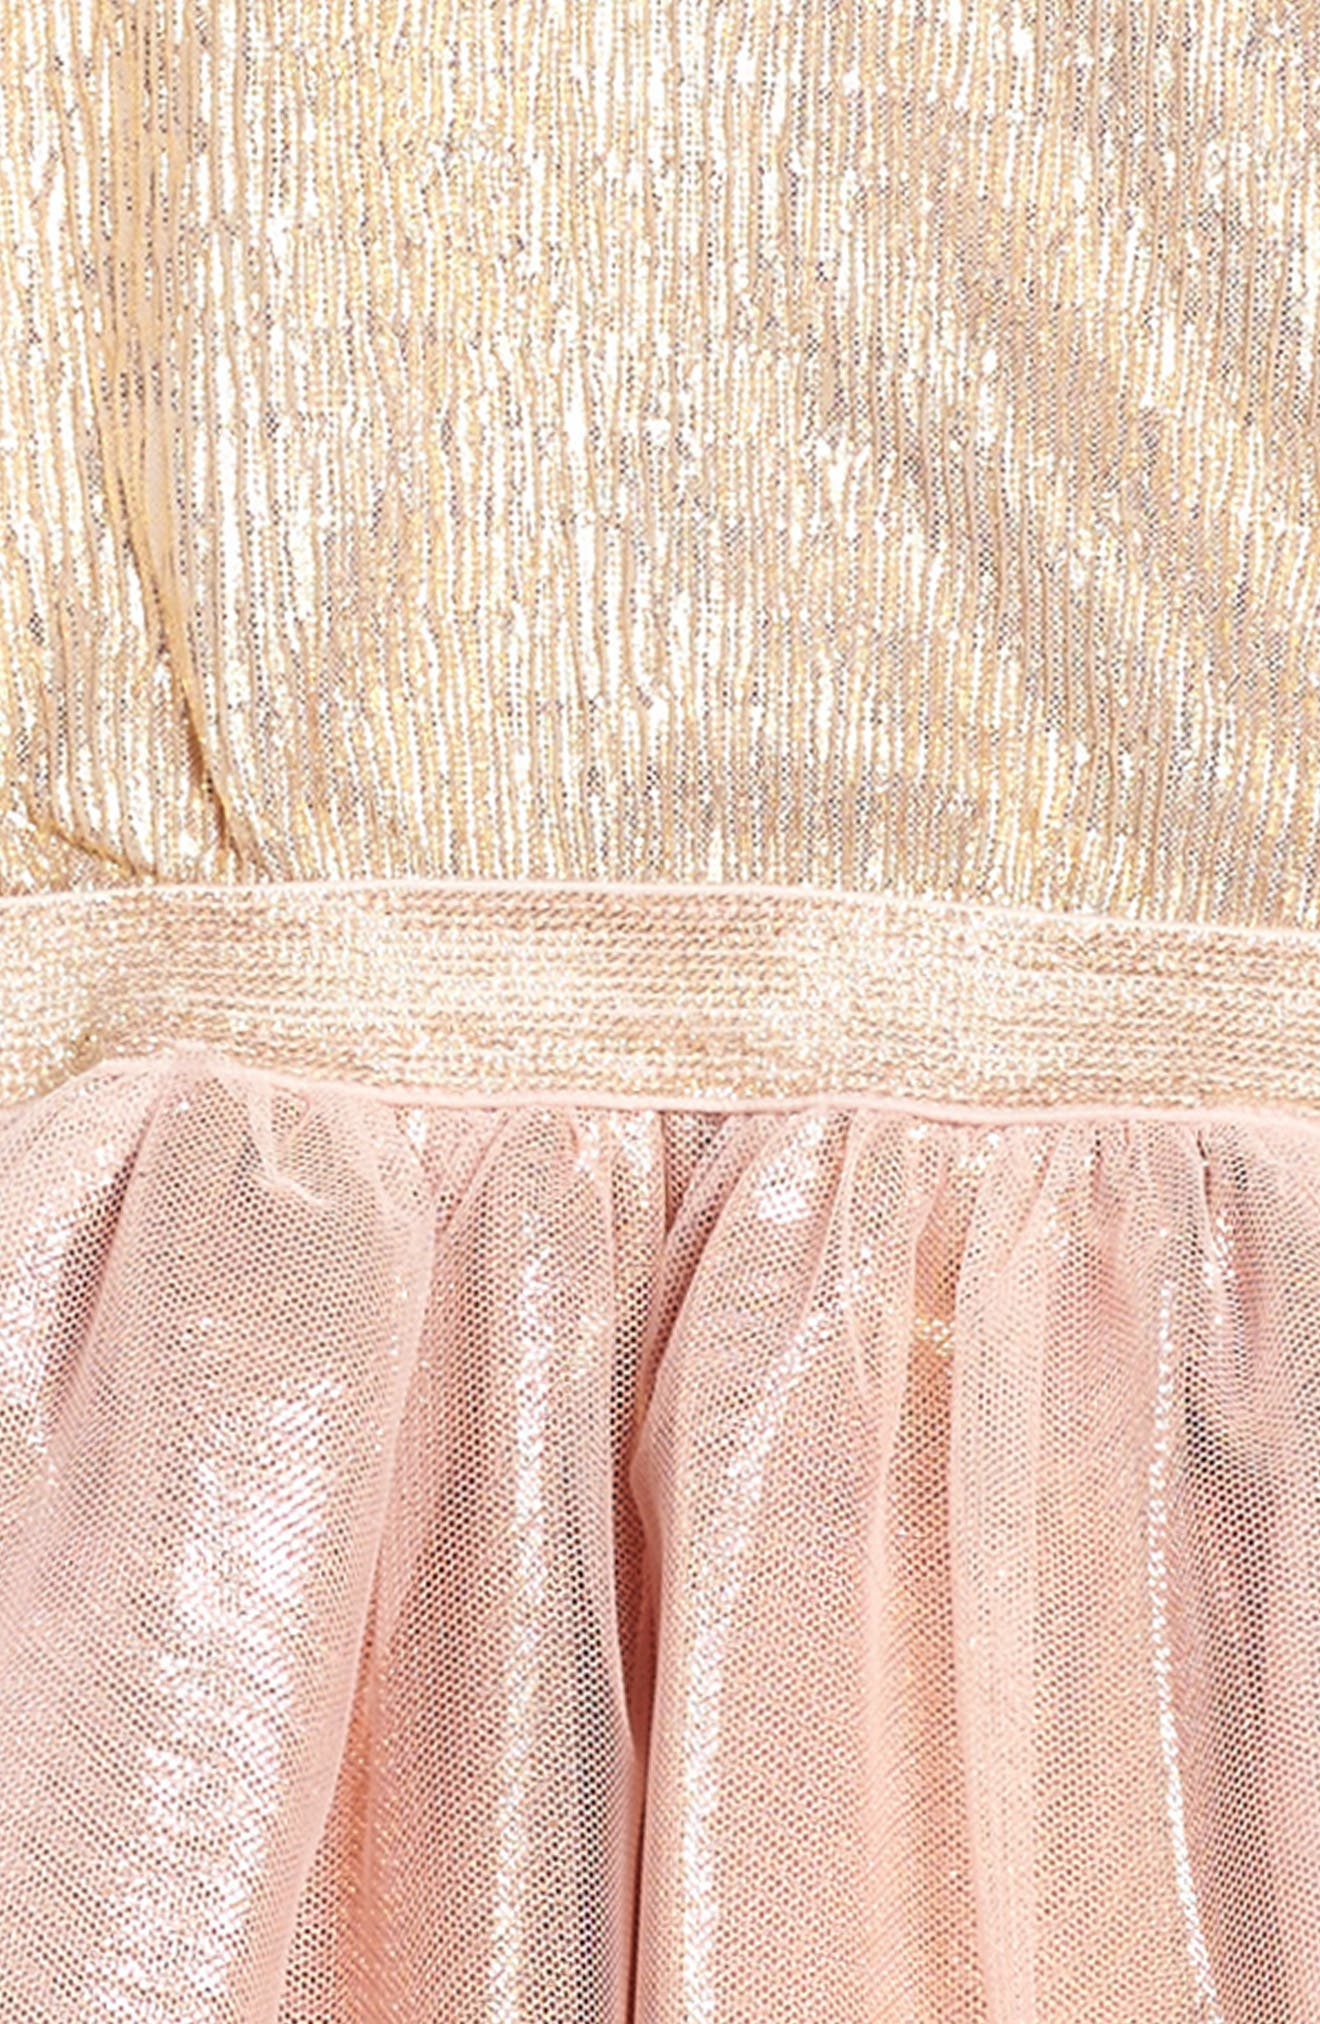 Alternate Image 3  - Zunie Metallic Shimmer Mock Neck Dress (Big Girls)